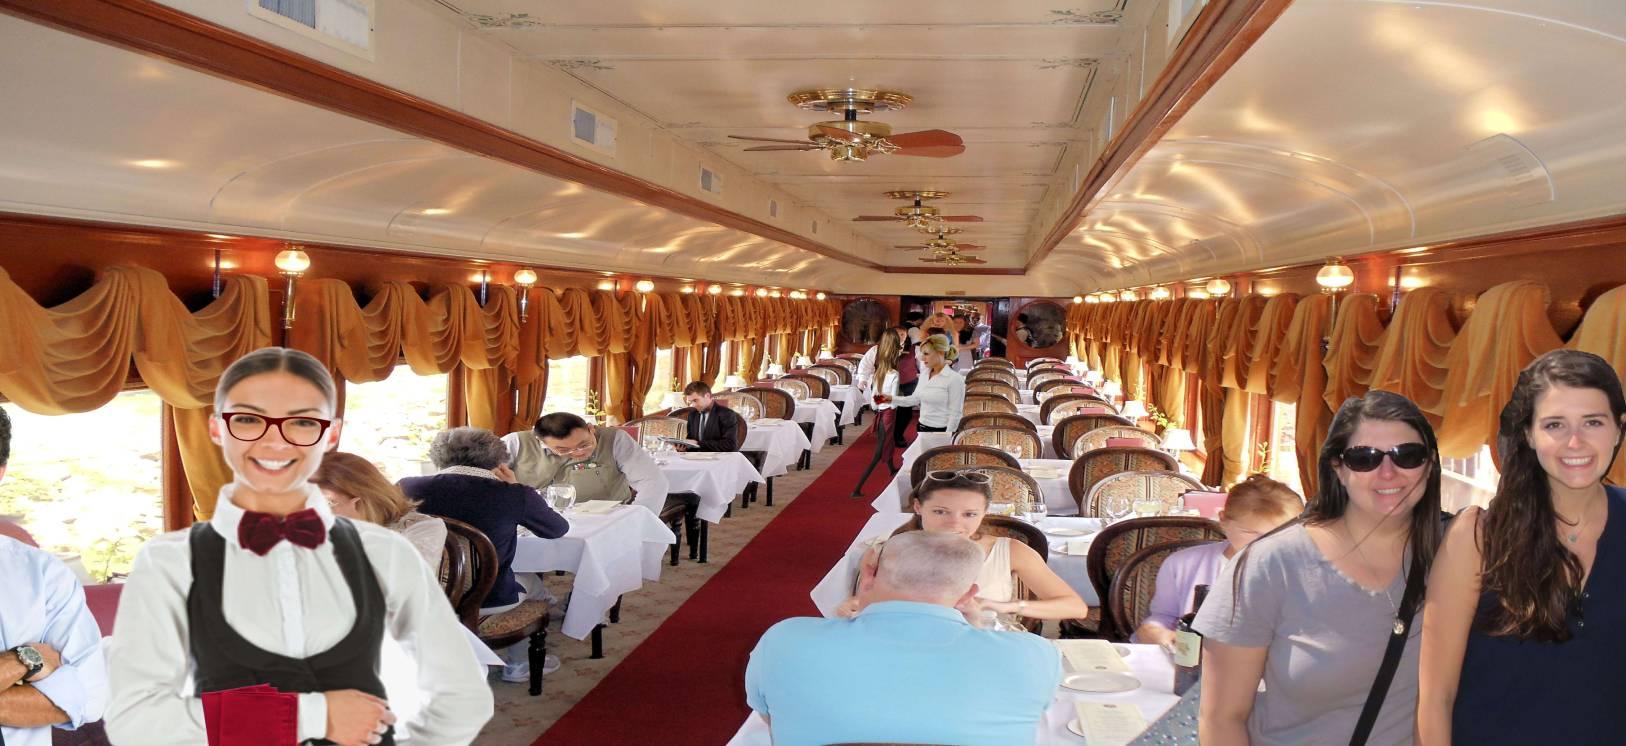 Napa-Valley-Wine-Train-Tour+Lunch